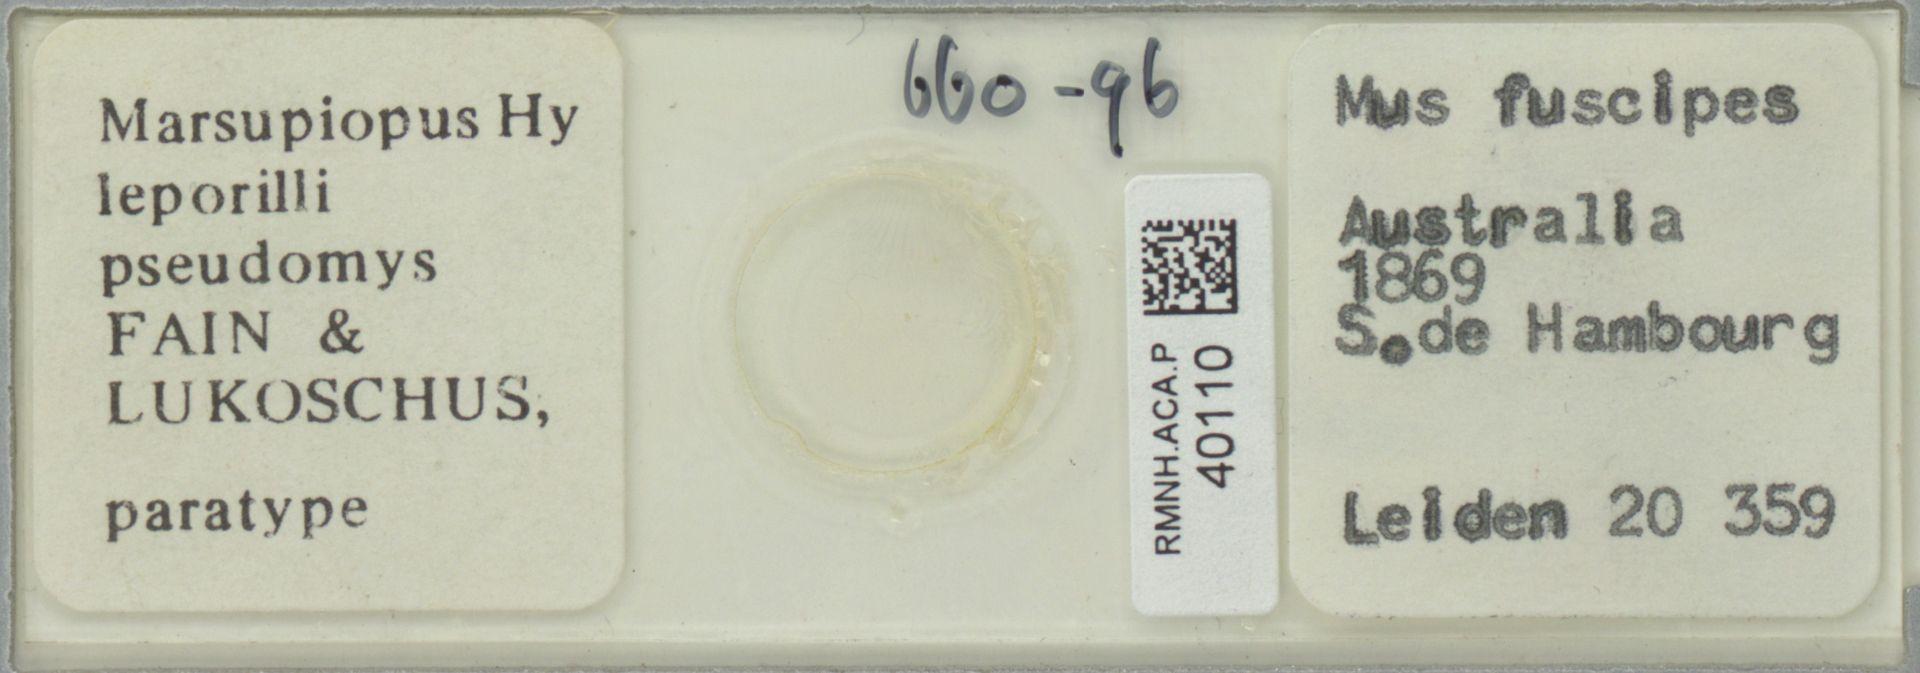 RMNH.ACA.P.40110 | Marsupiopus leporilli pseudomys Fain & Lukoschus